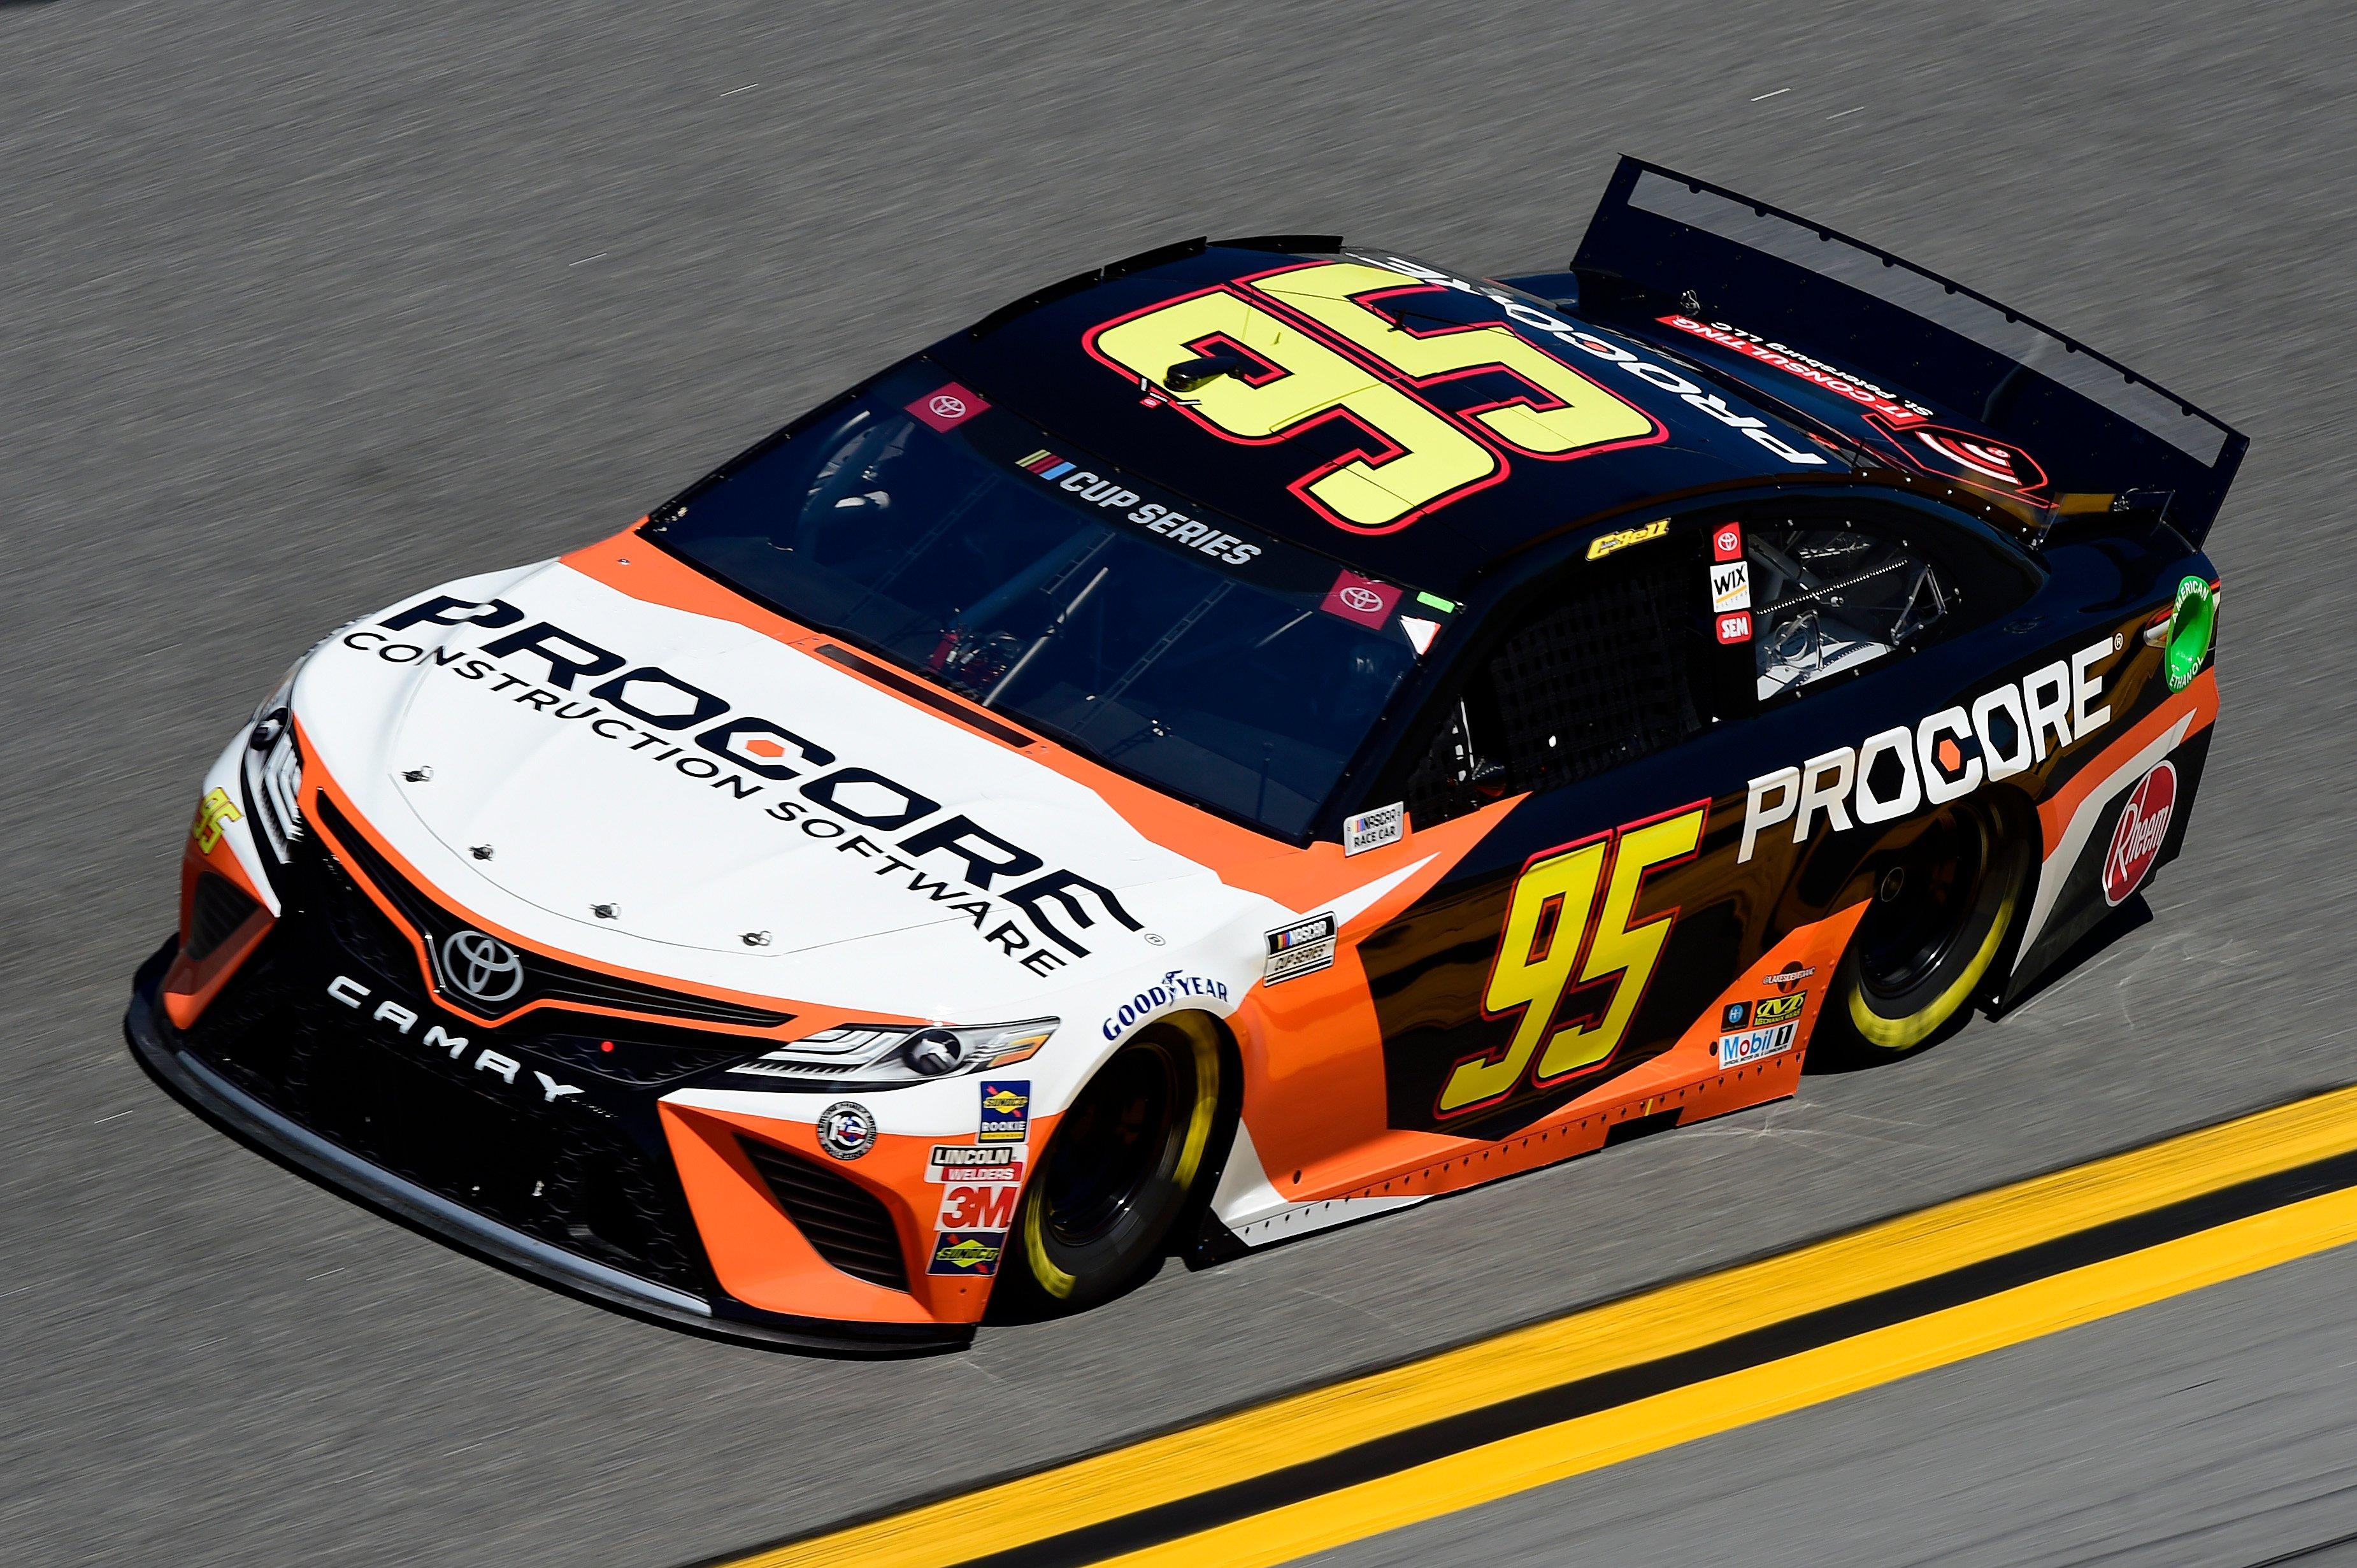 Christopher Bell - Daytona 500 - NASCAR Cup Series